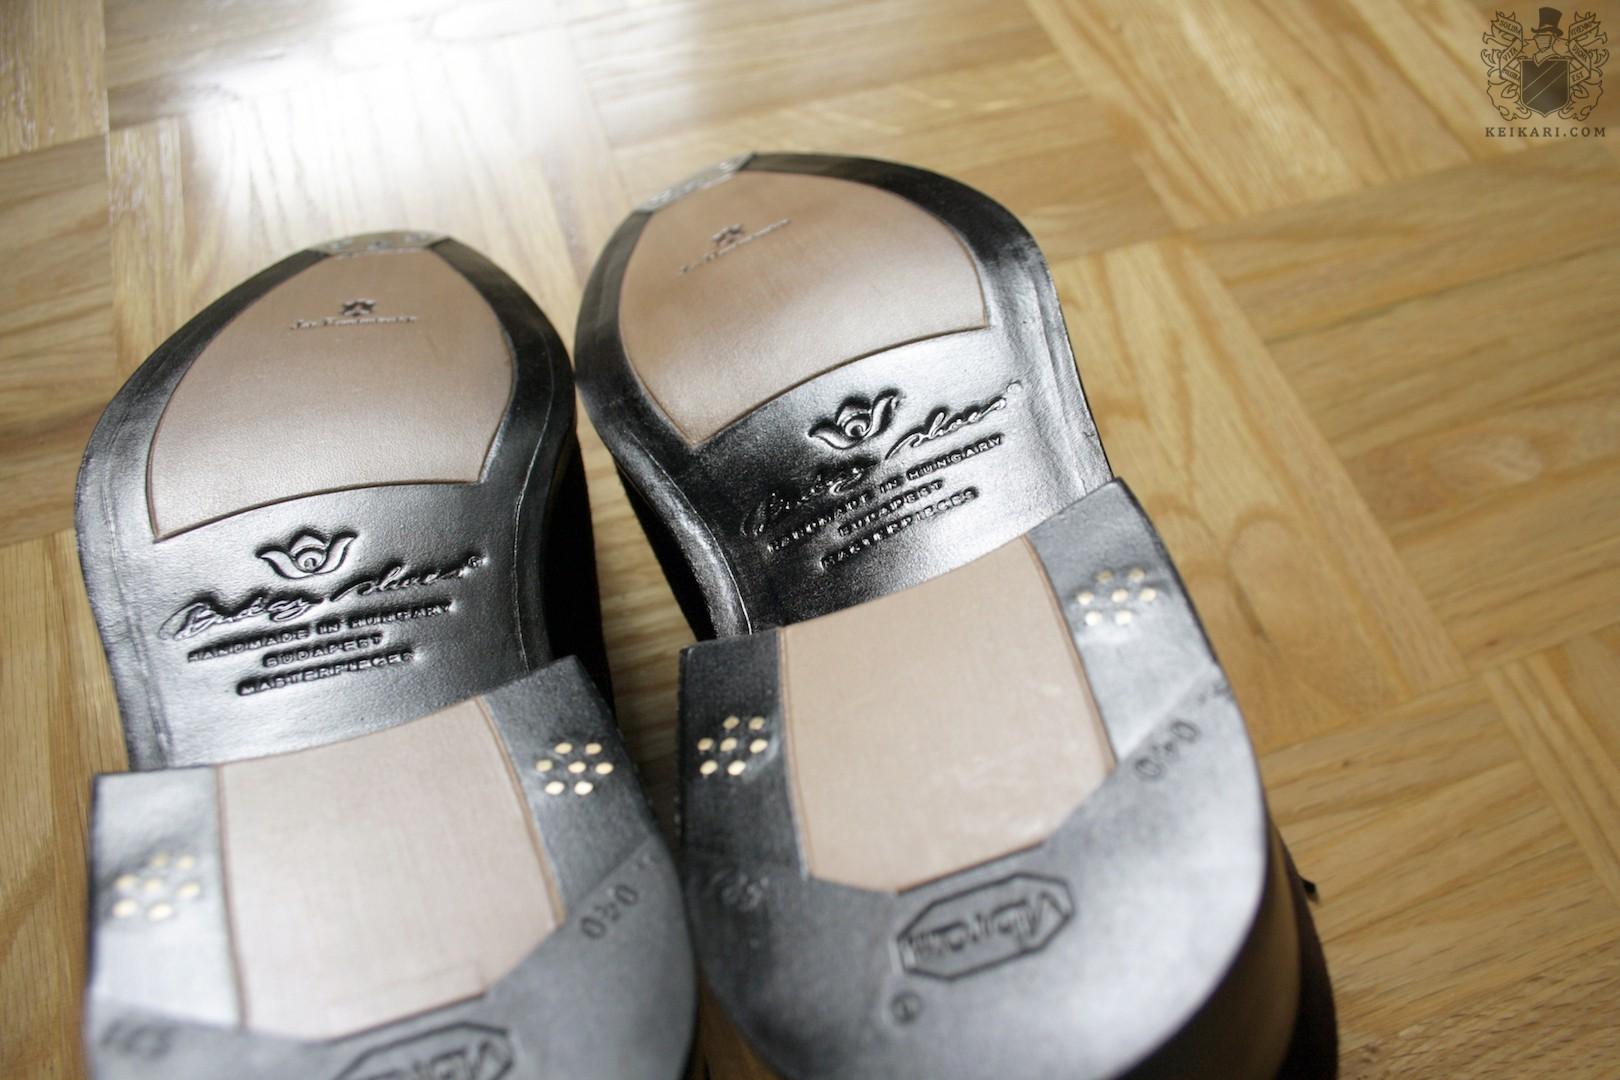 Anatomy_of_Buday_shoes_at_Keikari_dot_com17.jpg